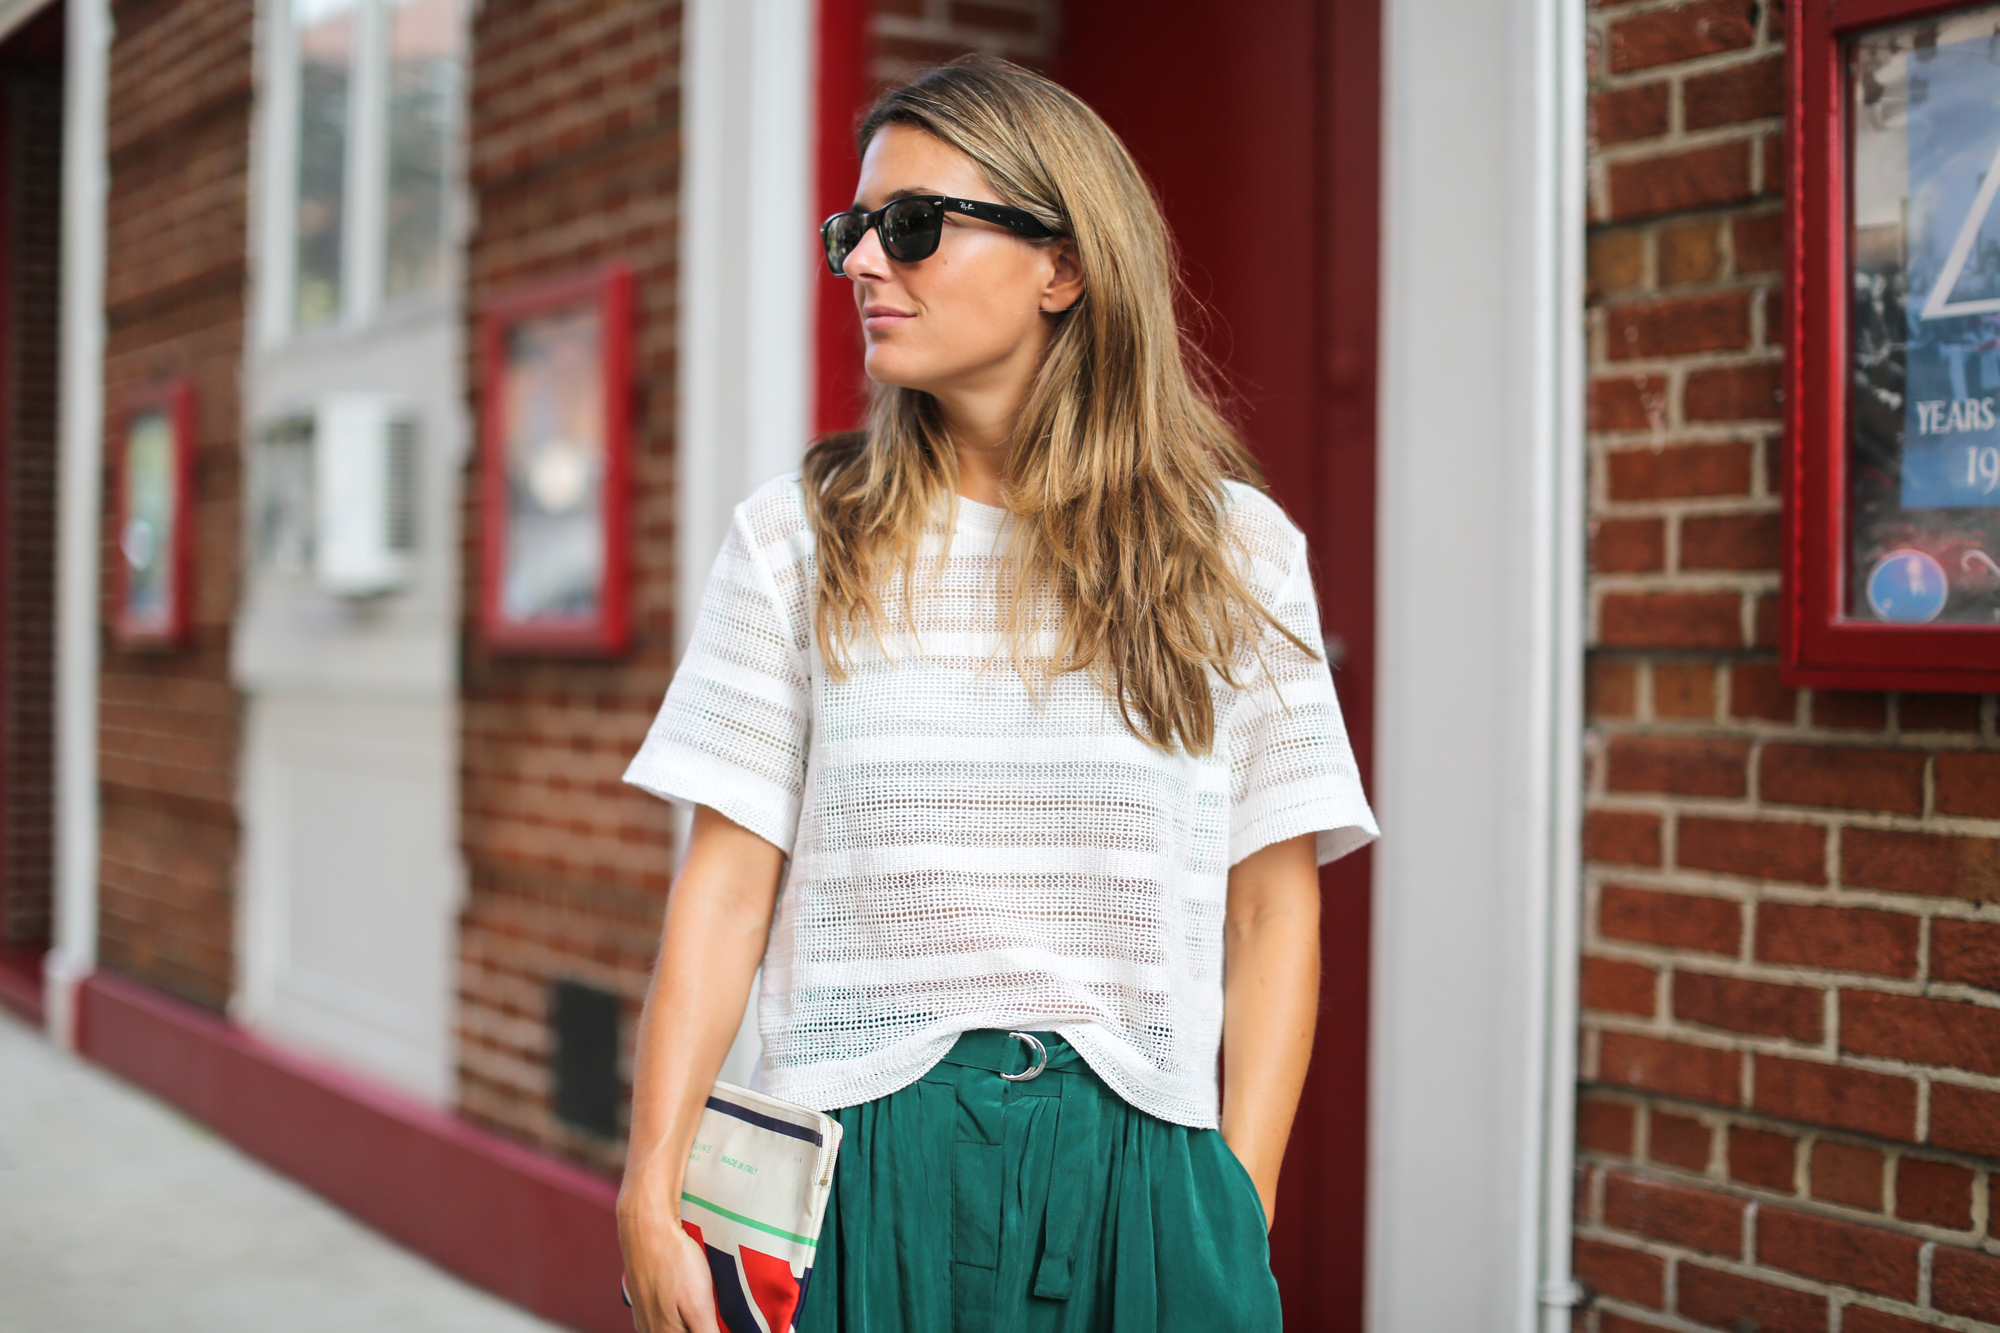 Clochet_streetstyle_newyork_h&m_trend_green_midi_skirt_adidas_stansmith-10